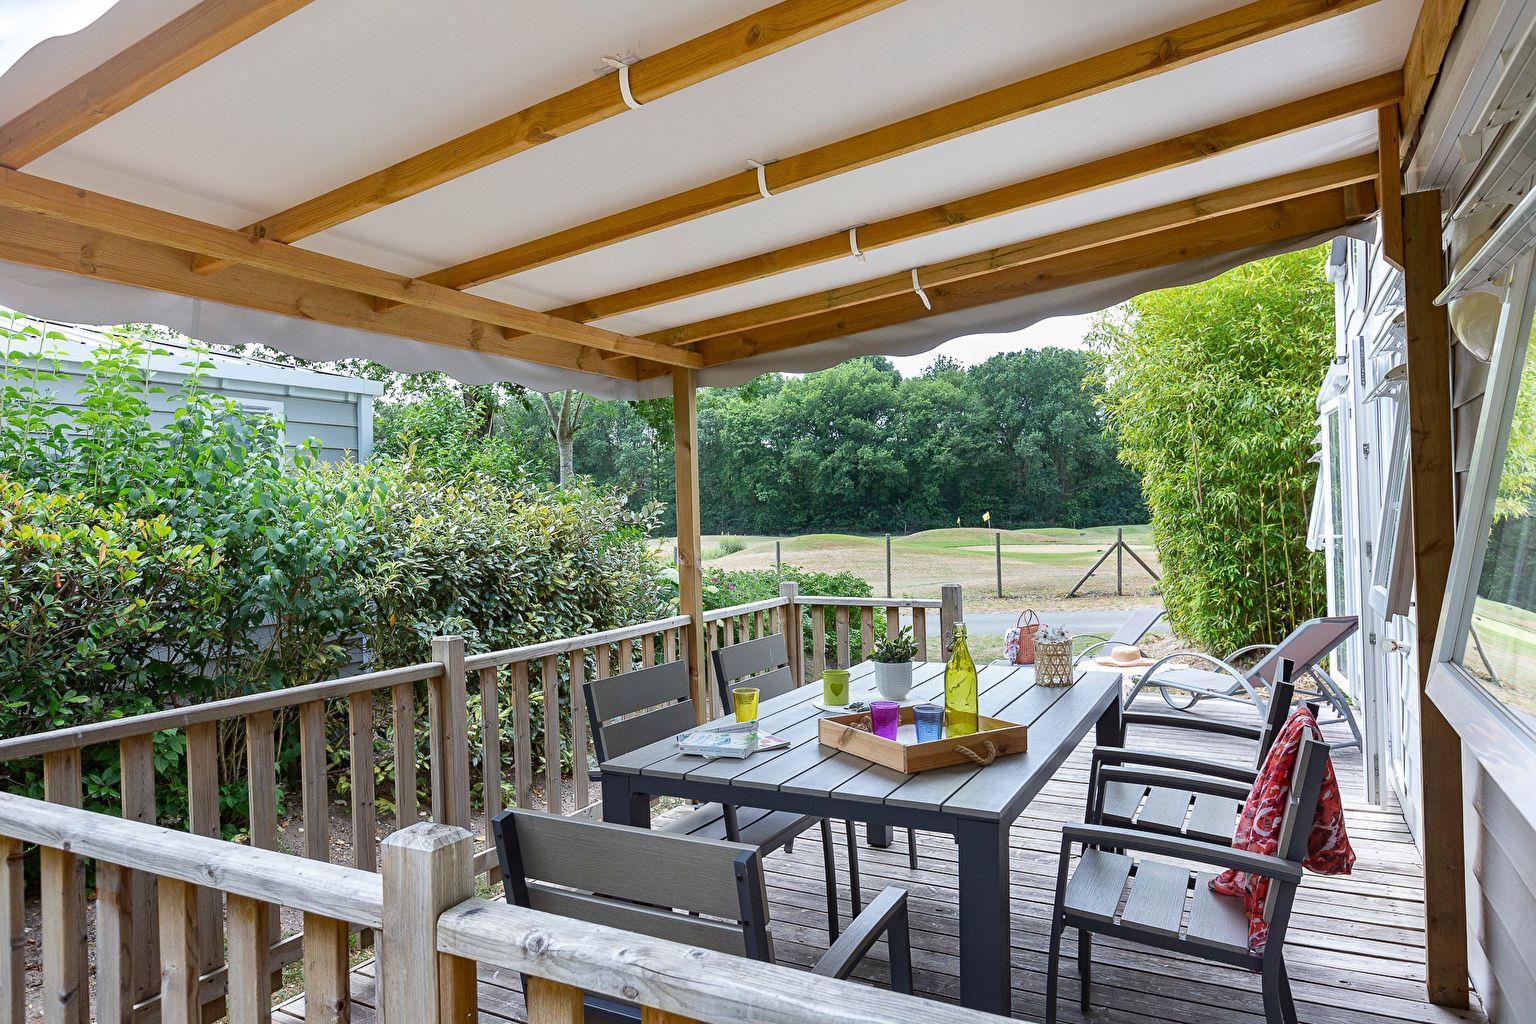 Location - Cottage 3 Chambres - 2 Salles De Bain - Climatisation **** - Camping Sandaya Les Alicourts Resort